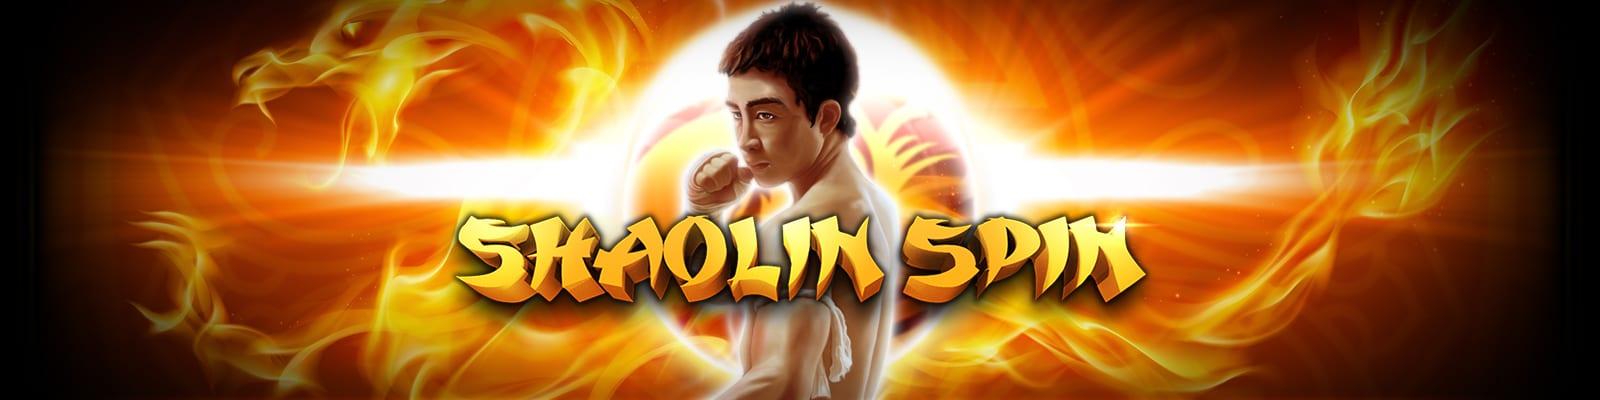 Shaolin Spin online slots game logo